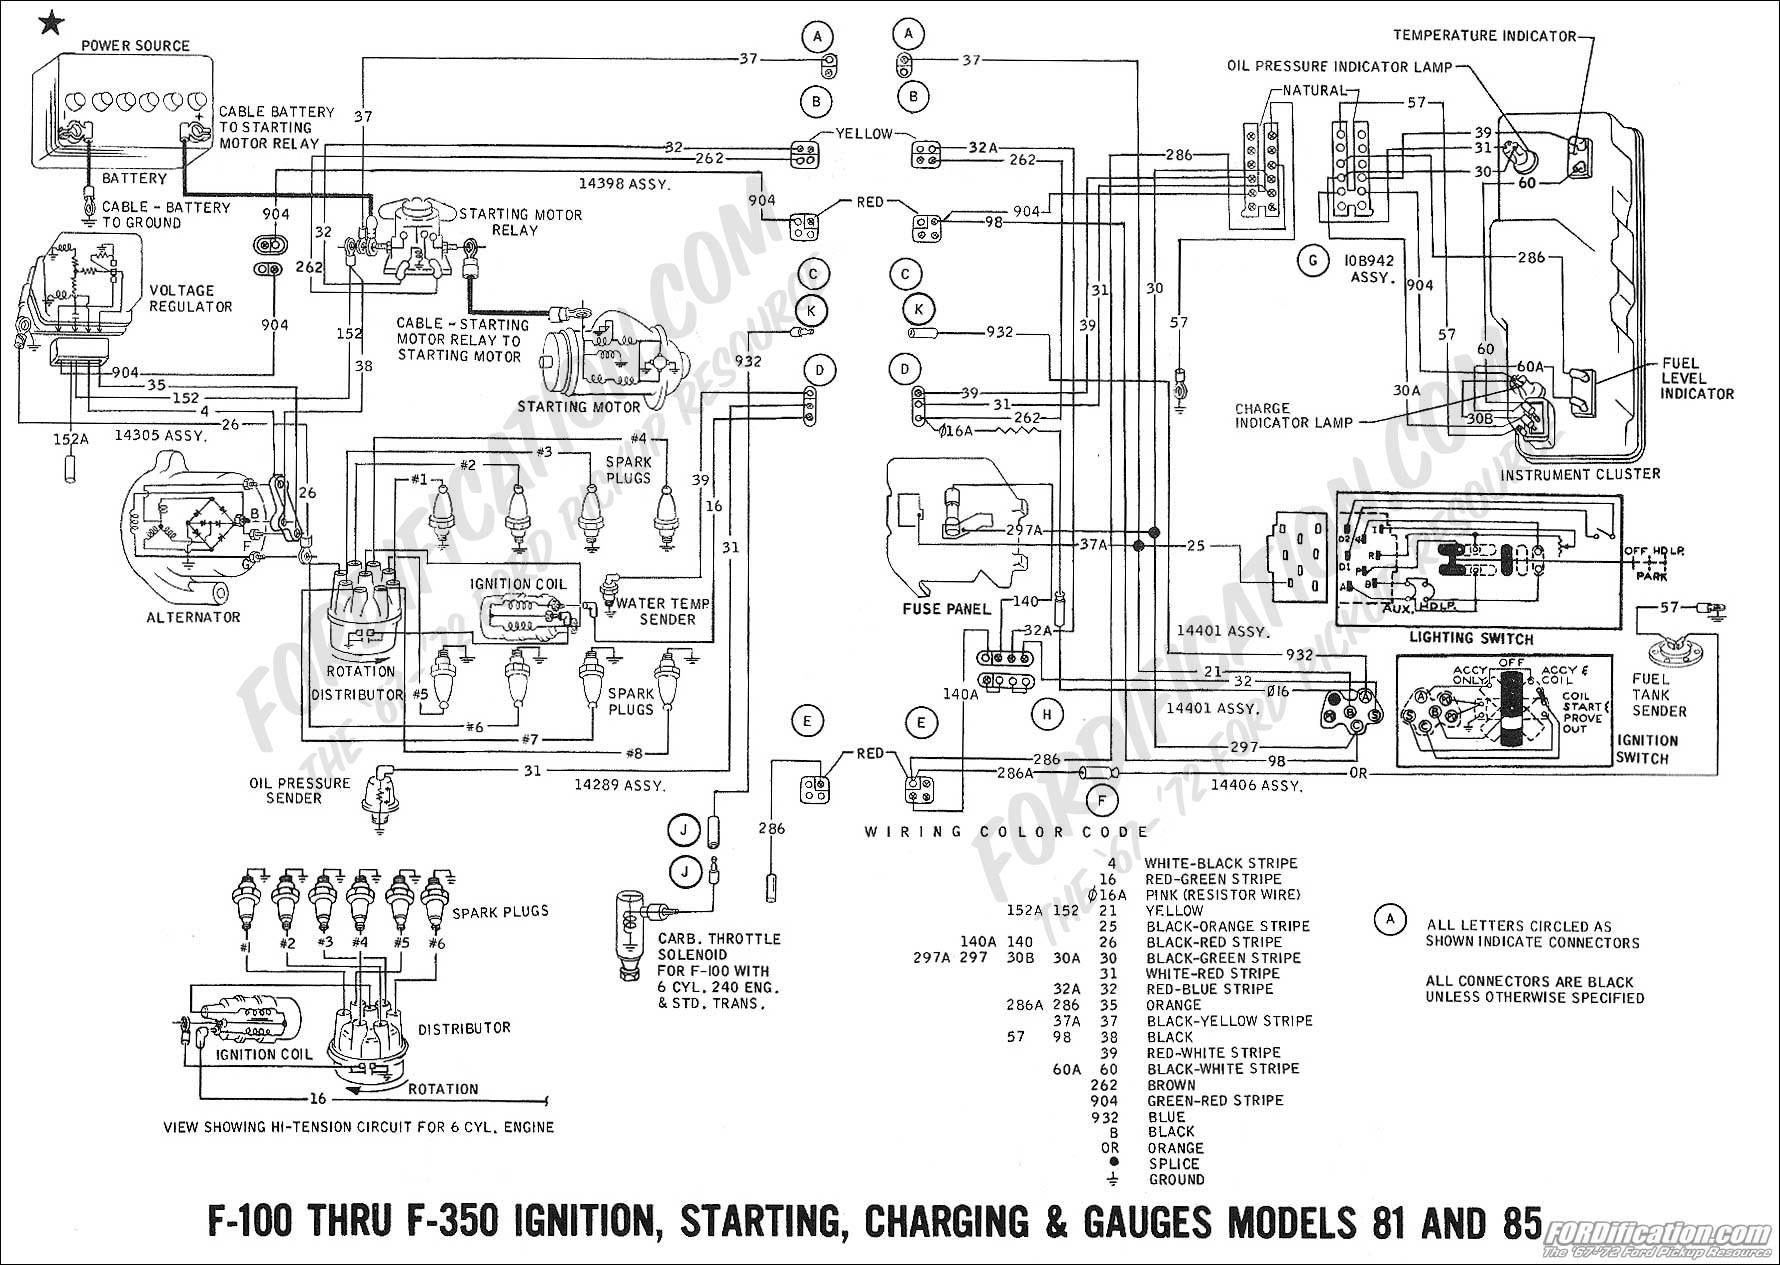 70 bronco wiring diagram free image about wiring diagram rh wuzzie co Saturn  Engine Parts Diagram 2003 Saturn Vue Engine Diagram